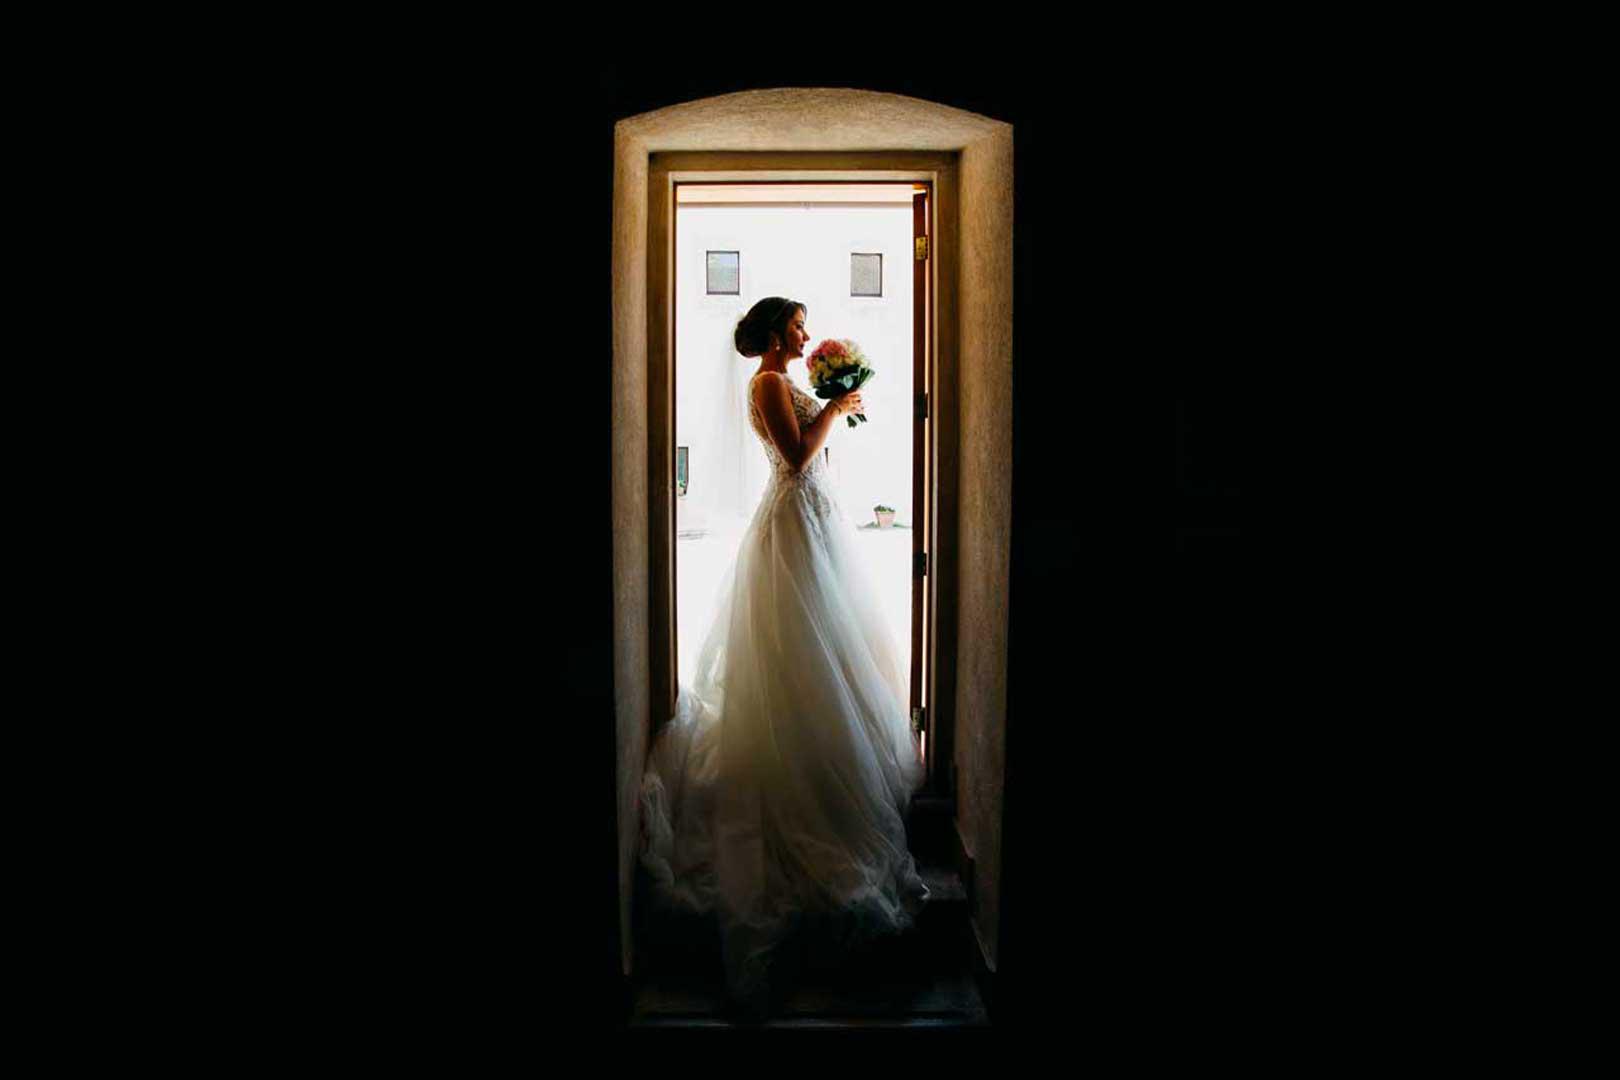 022-sposa-matrimonio-puglia-gianni-lepore-fotografo